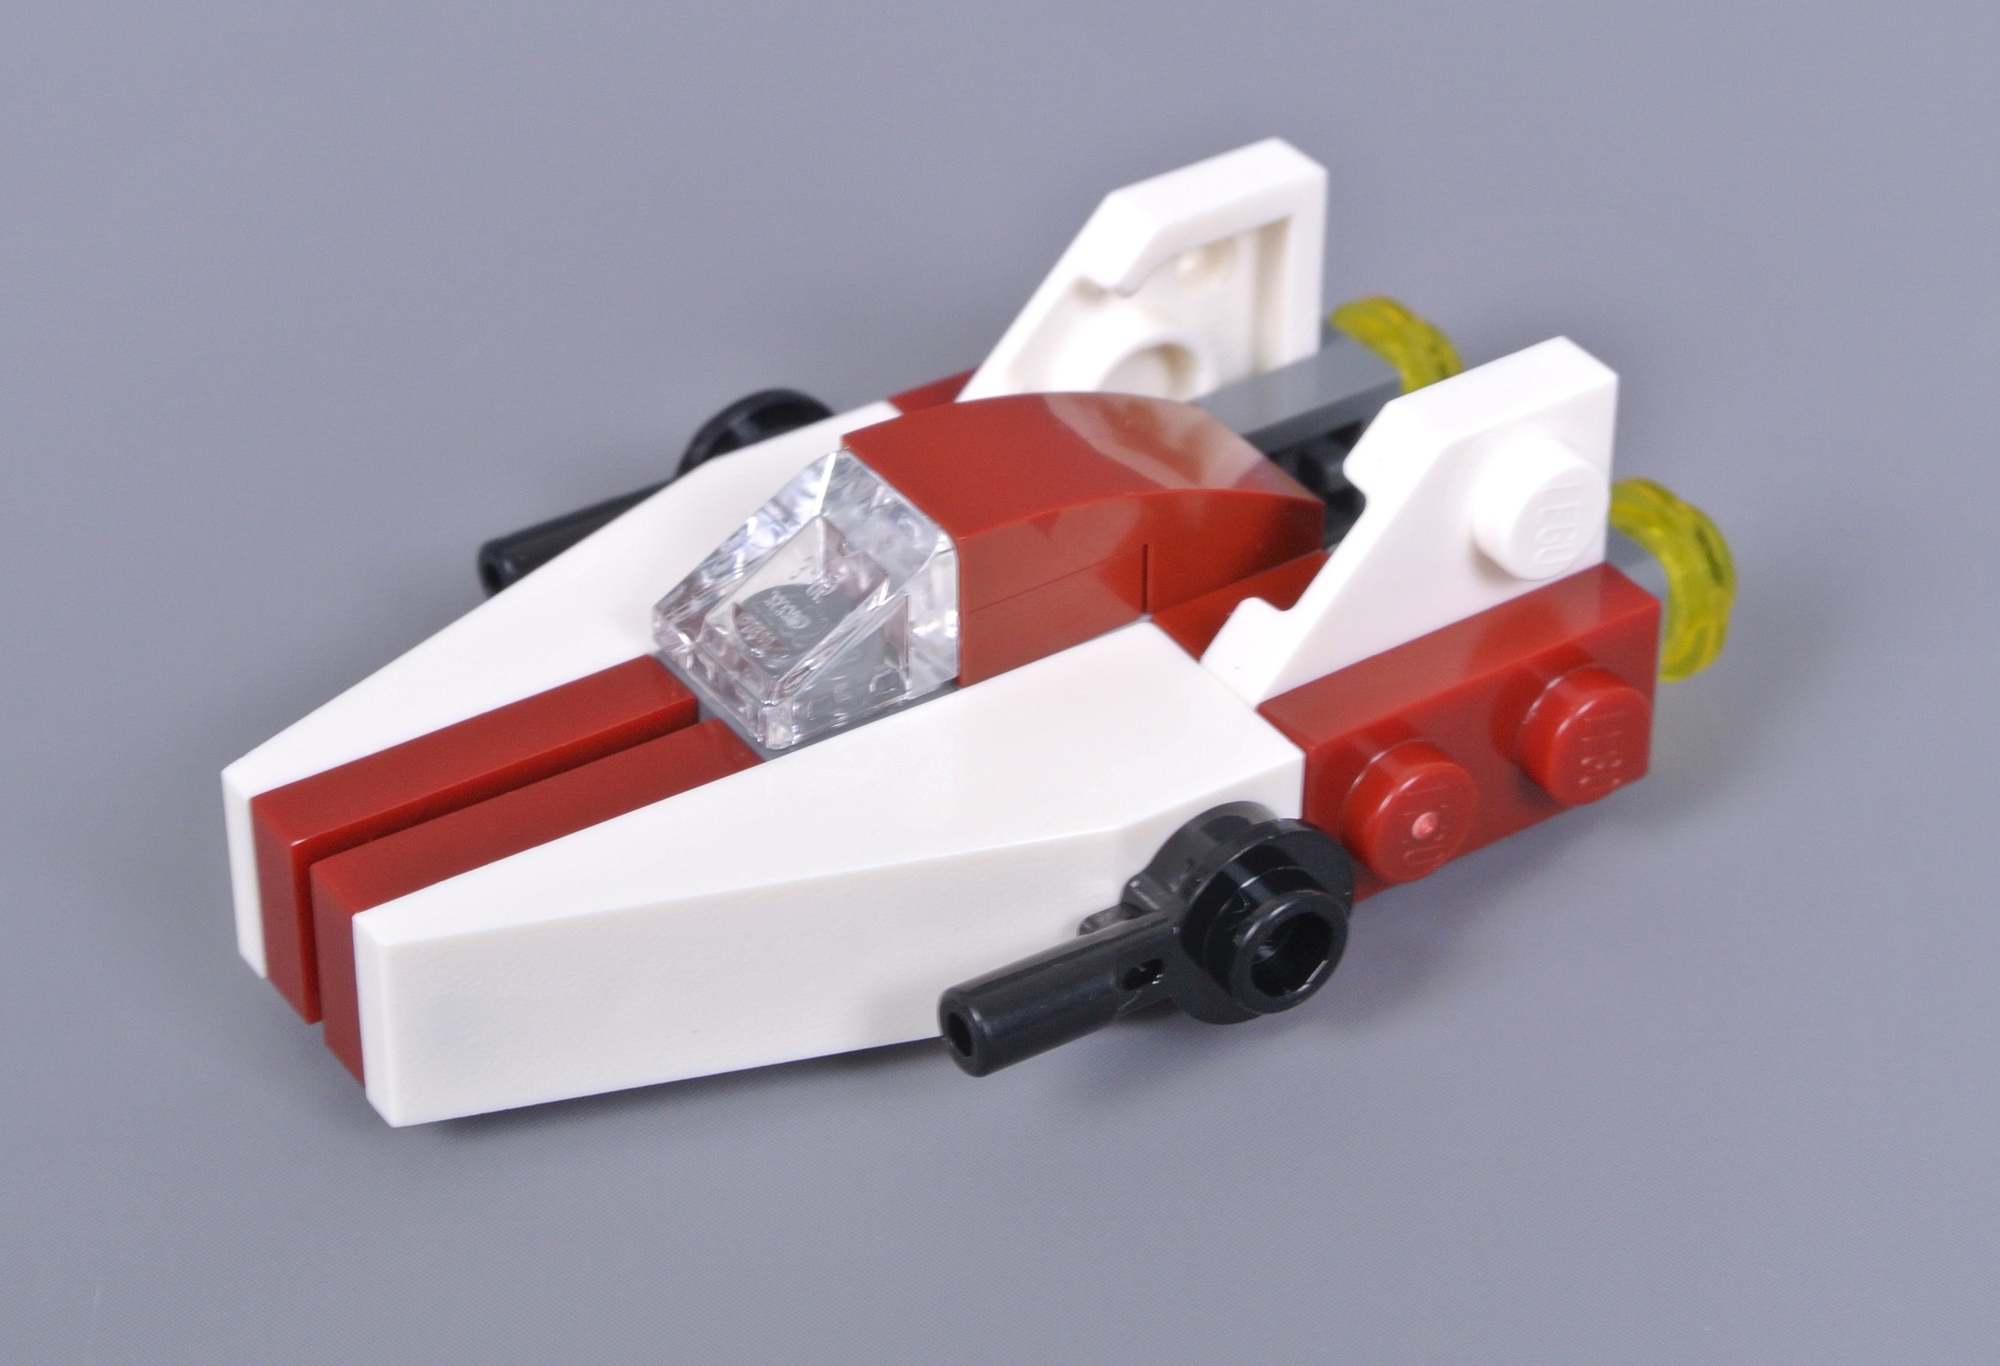 Star Wars Advent Calendar - Day 1 | Brickset: Lego Set Guide